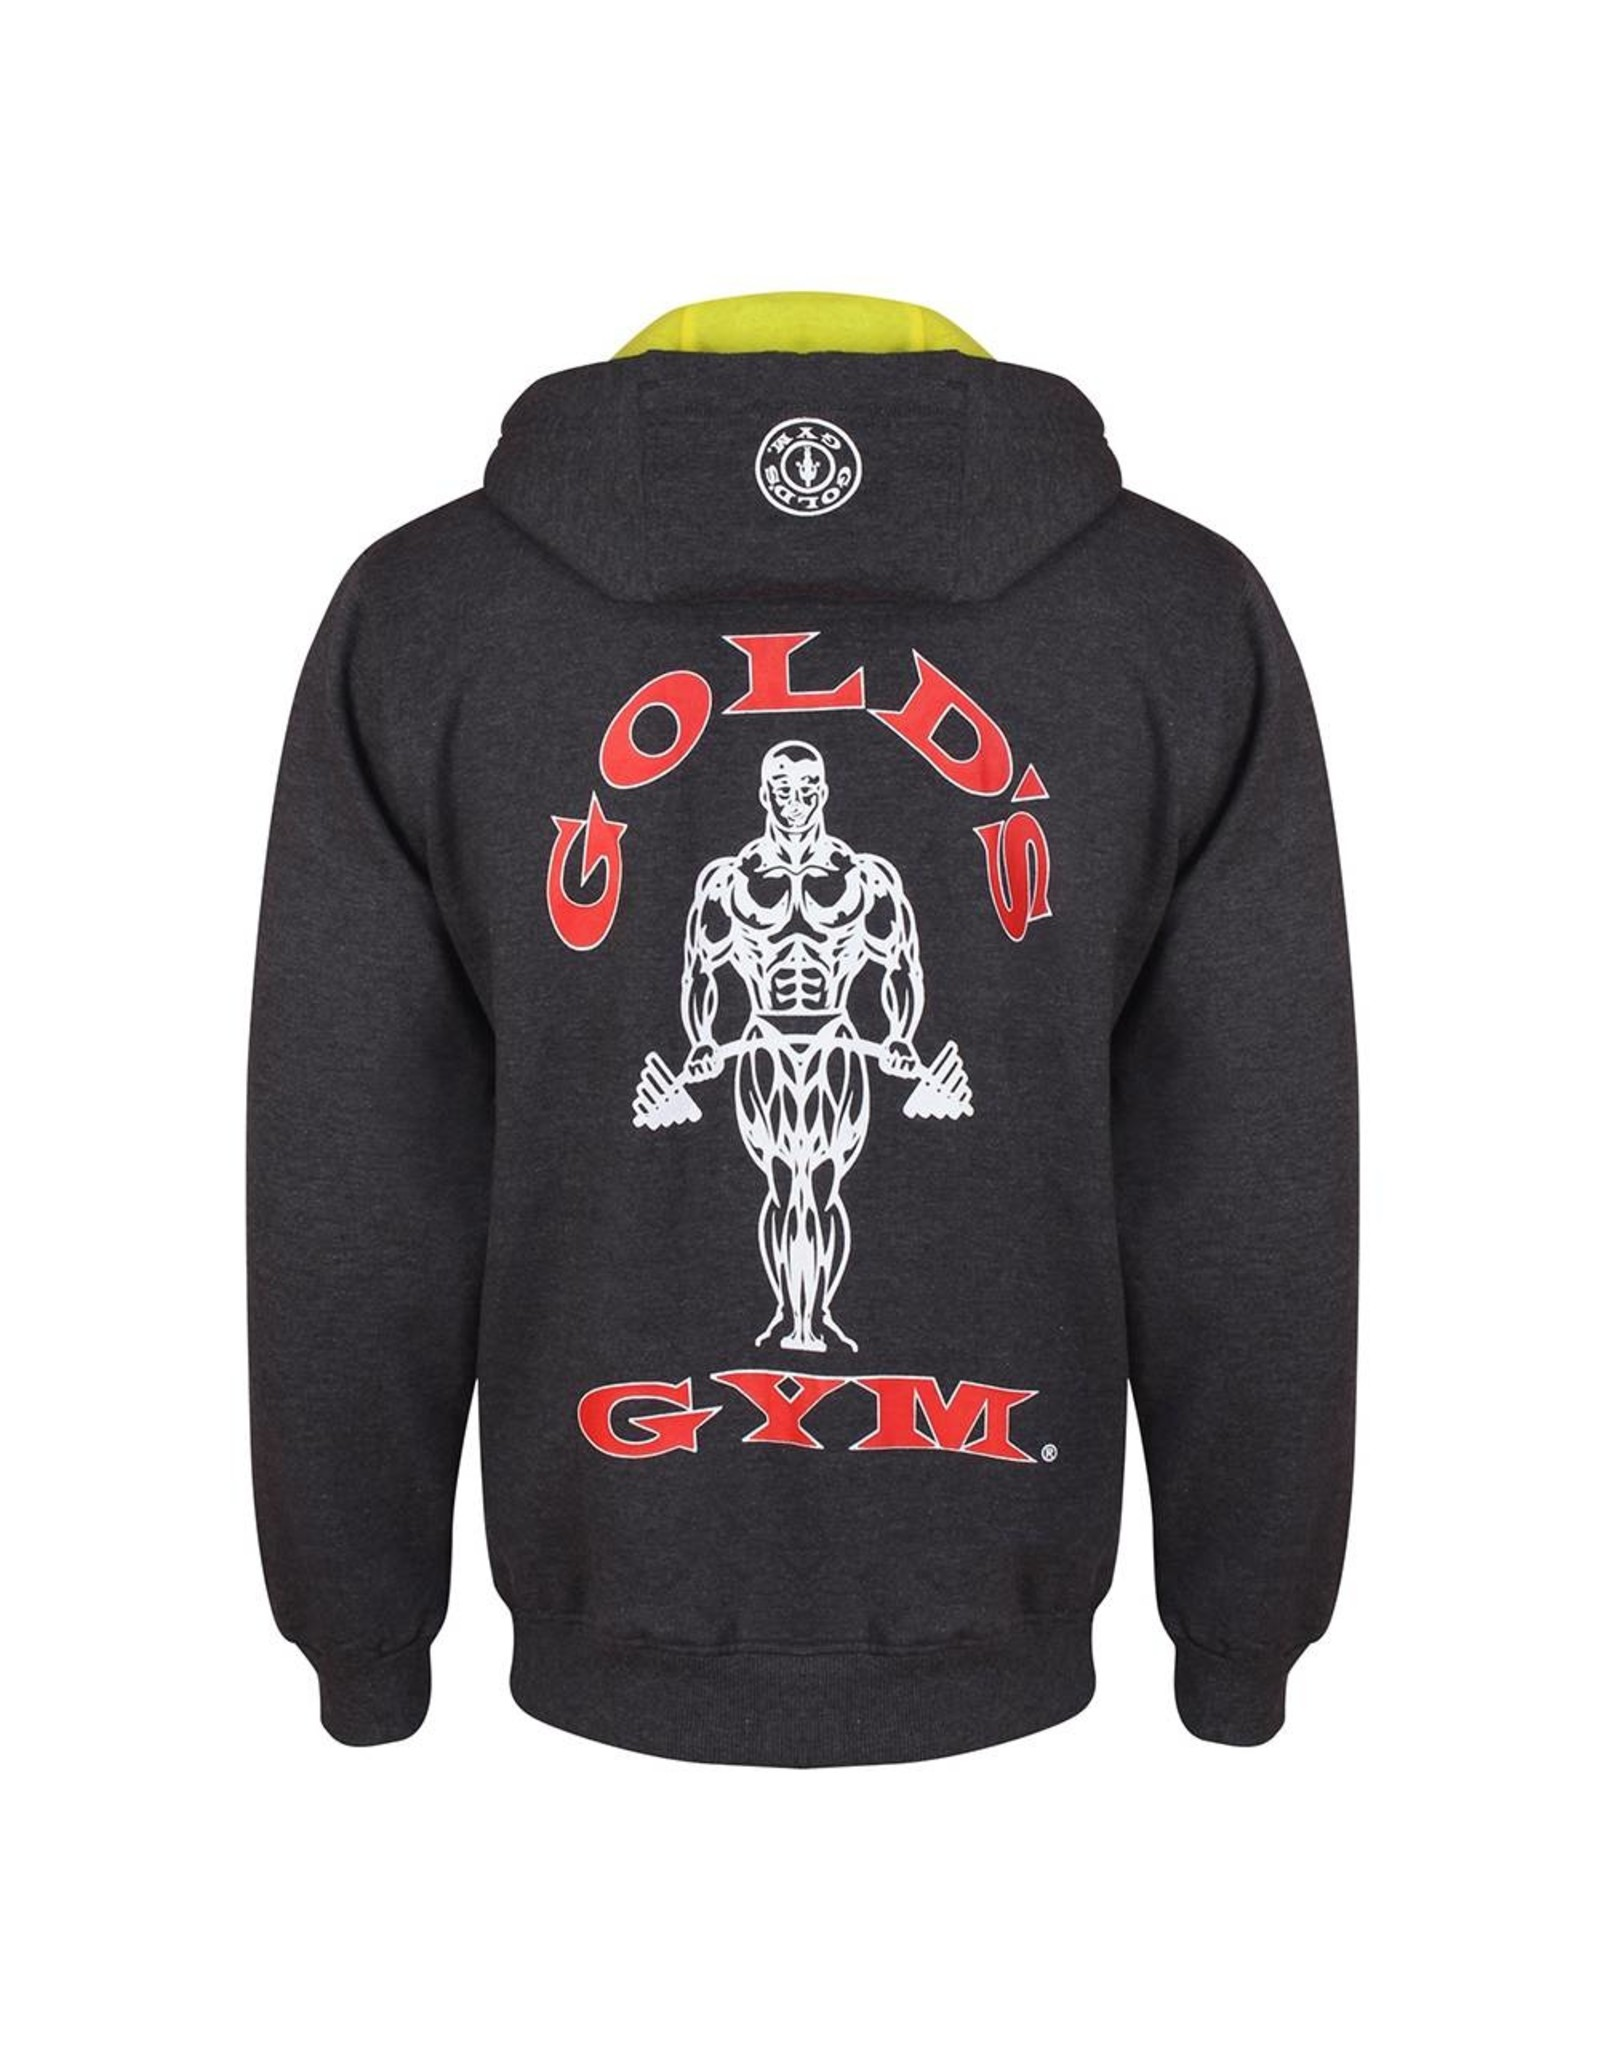 Gold's Gym Zip Through Muscle Joe Hoodie - Charcoal Marl